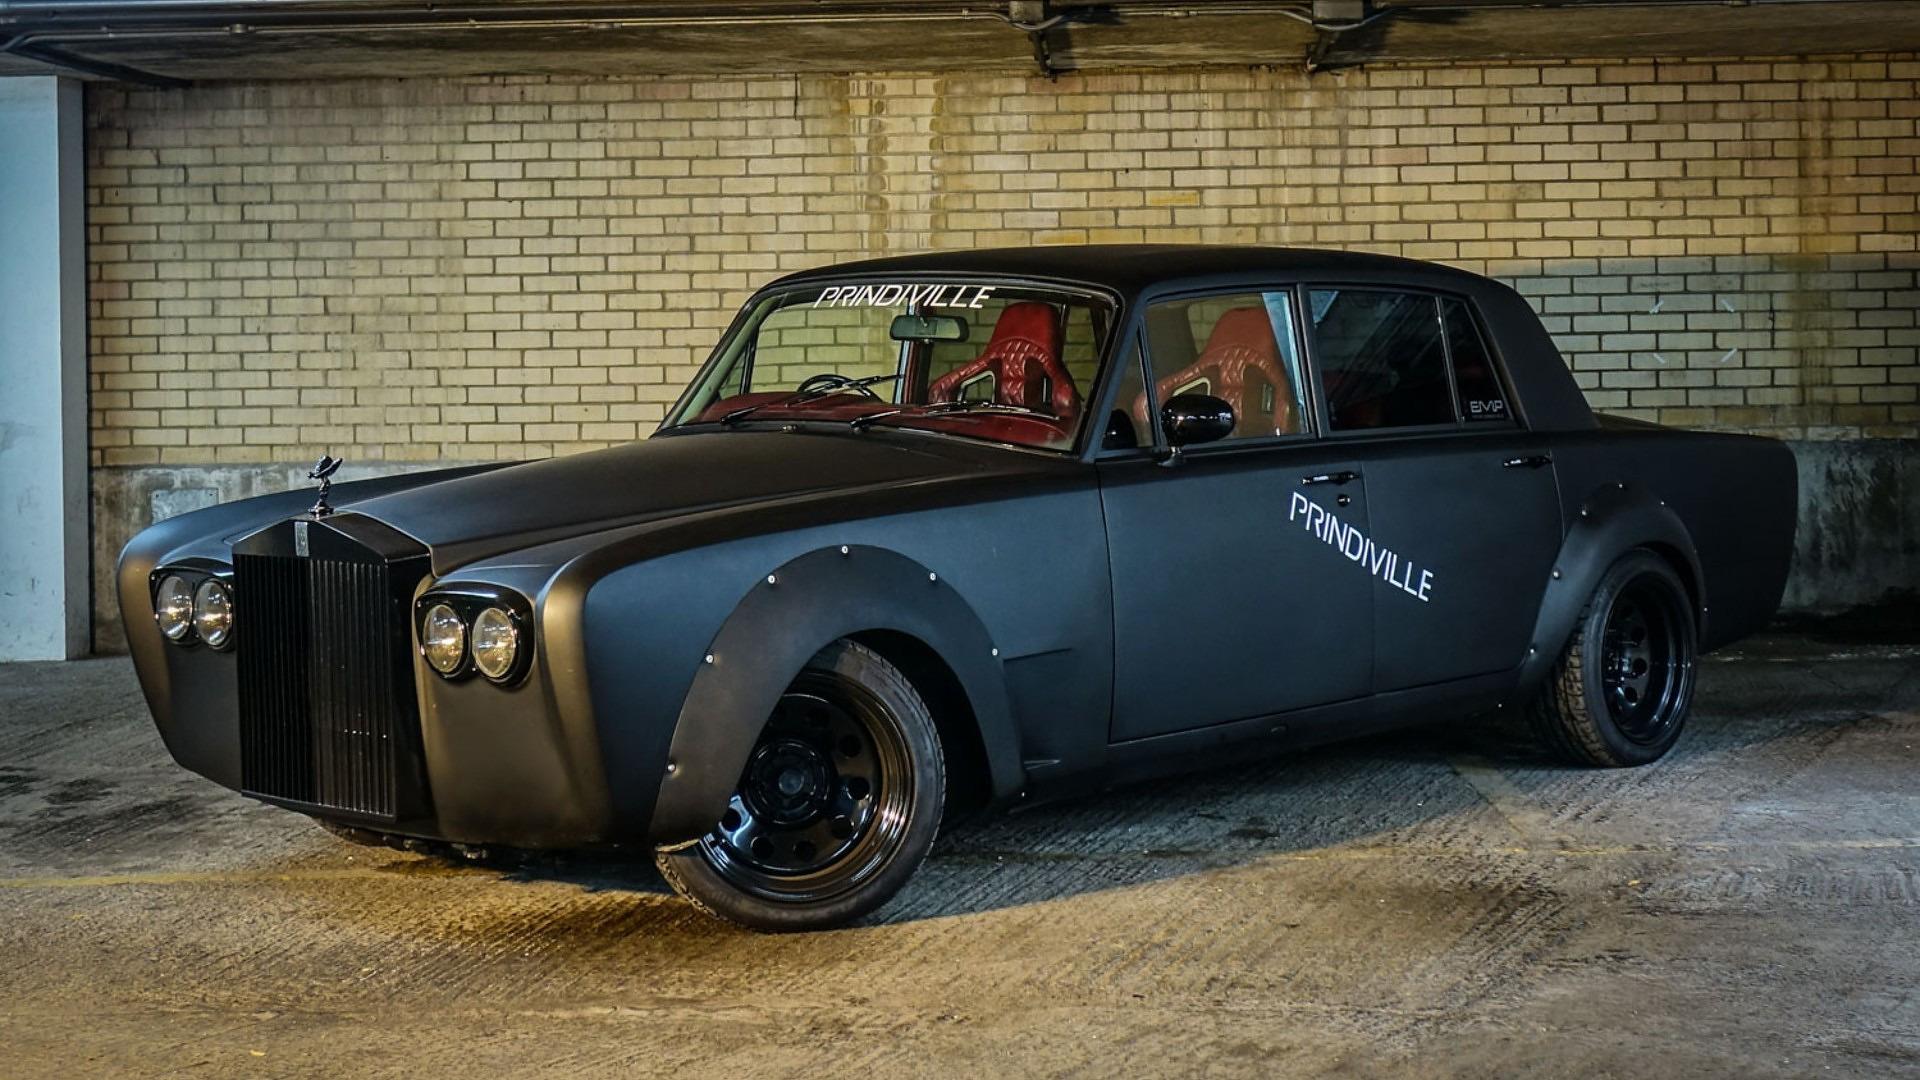 Evil Rolls-Royce Silver Shadow Drift Car Selling For $130k